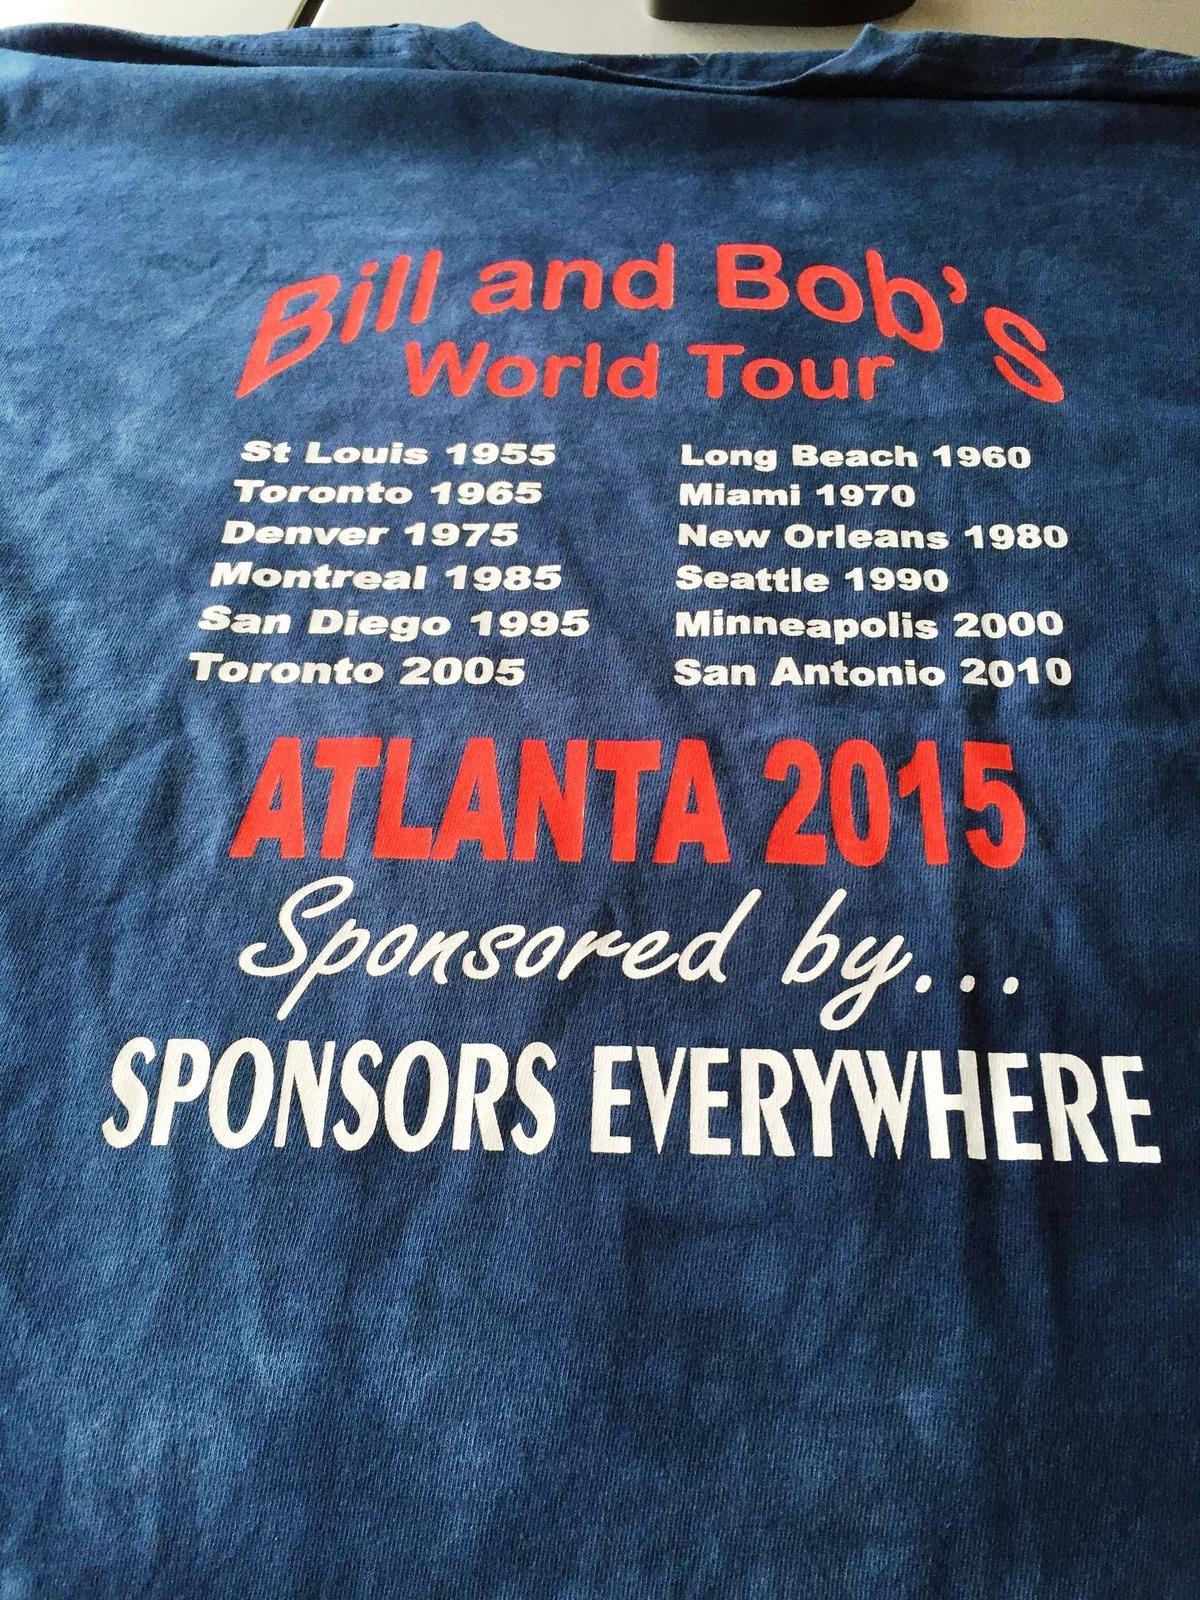 Congrès international, Atlanta 2015